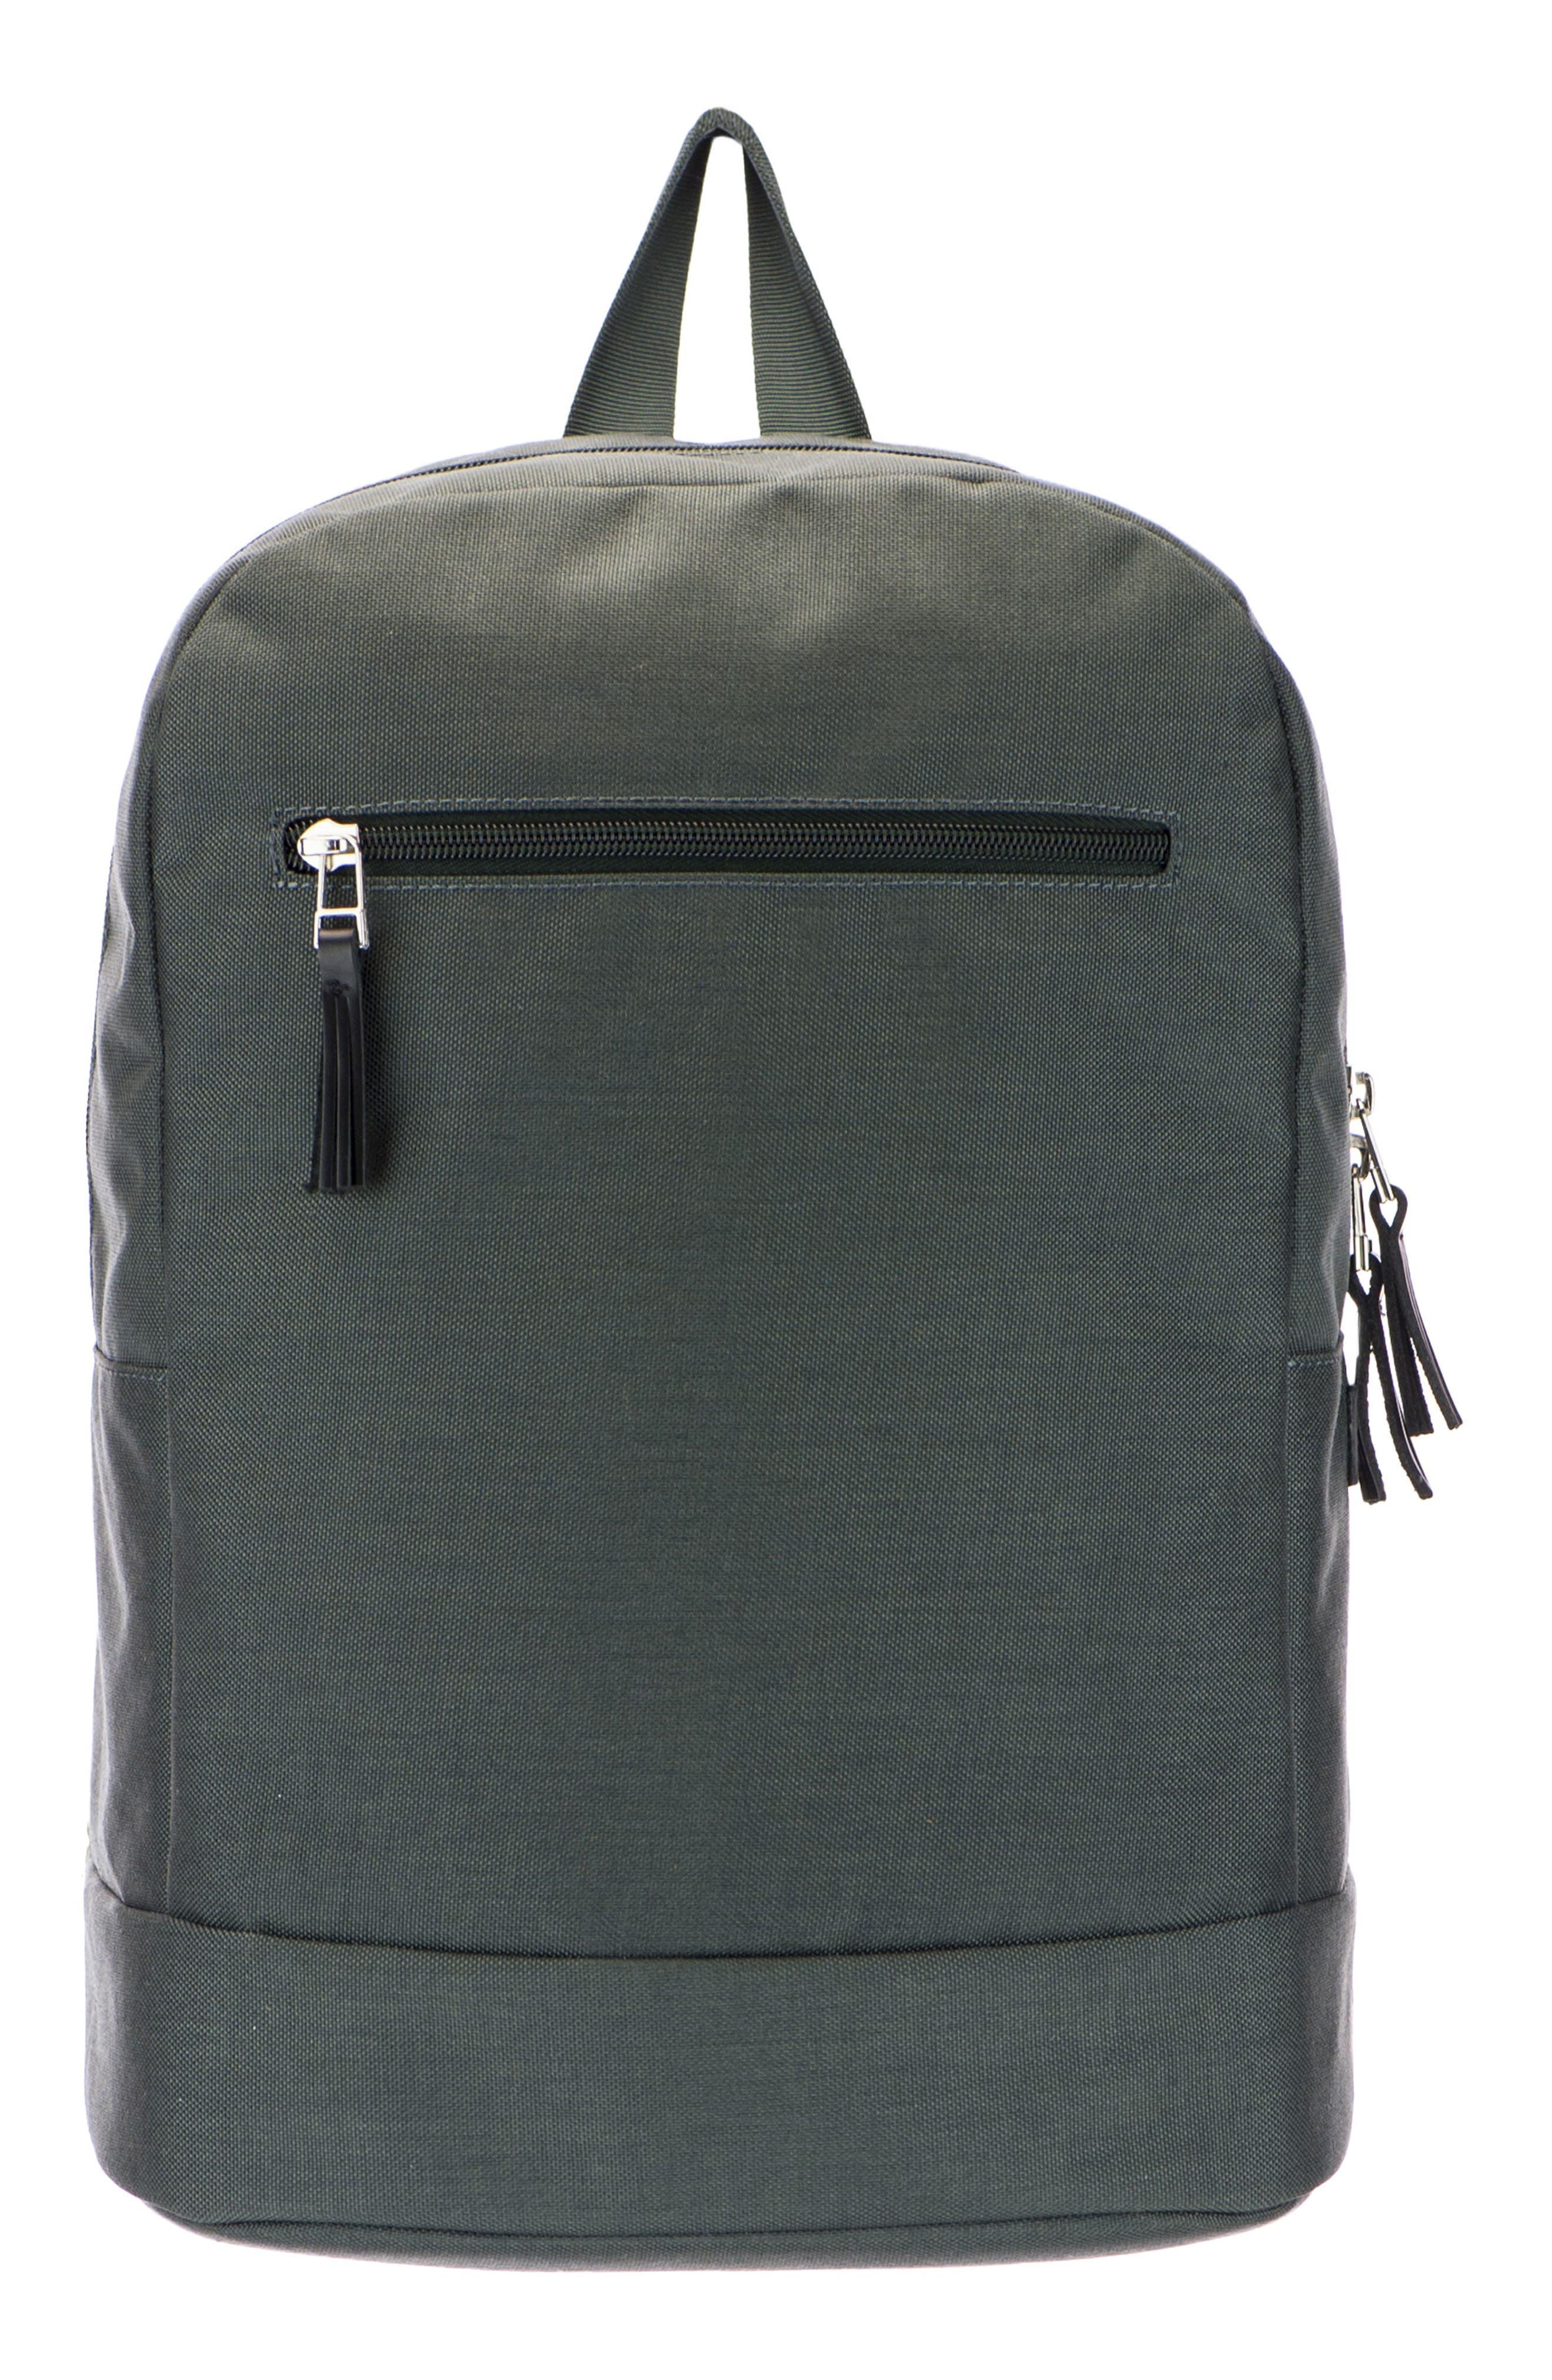 Tomcat Backpack,                             Main thumbnail 2, color,